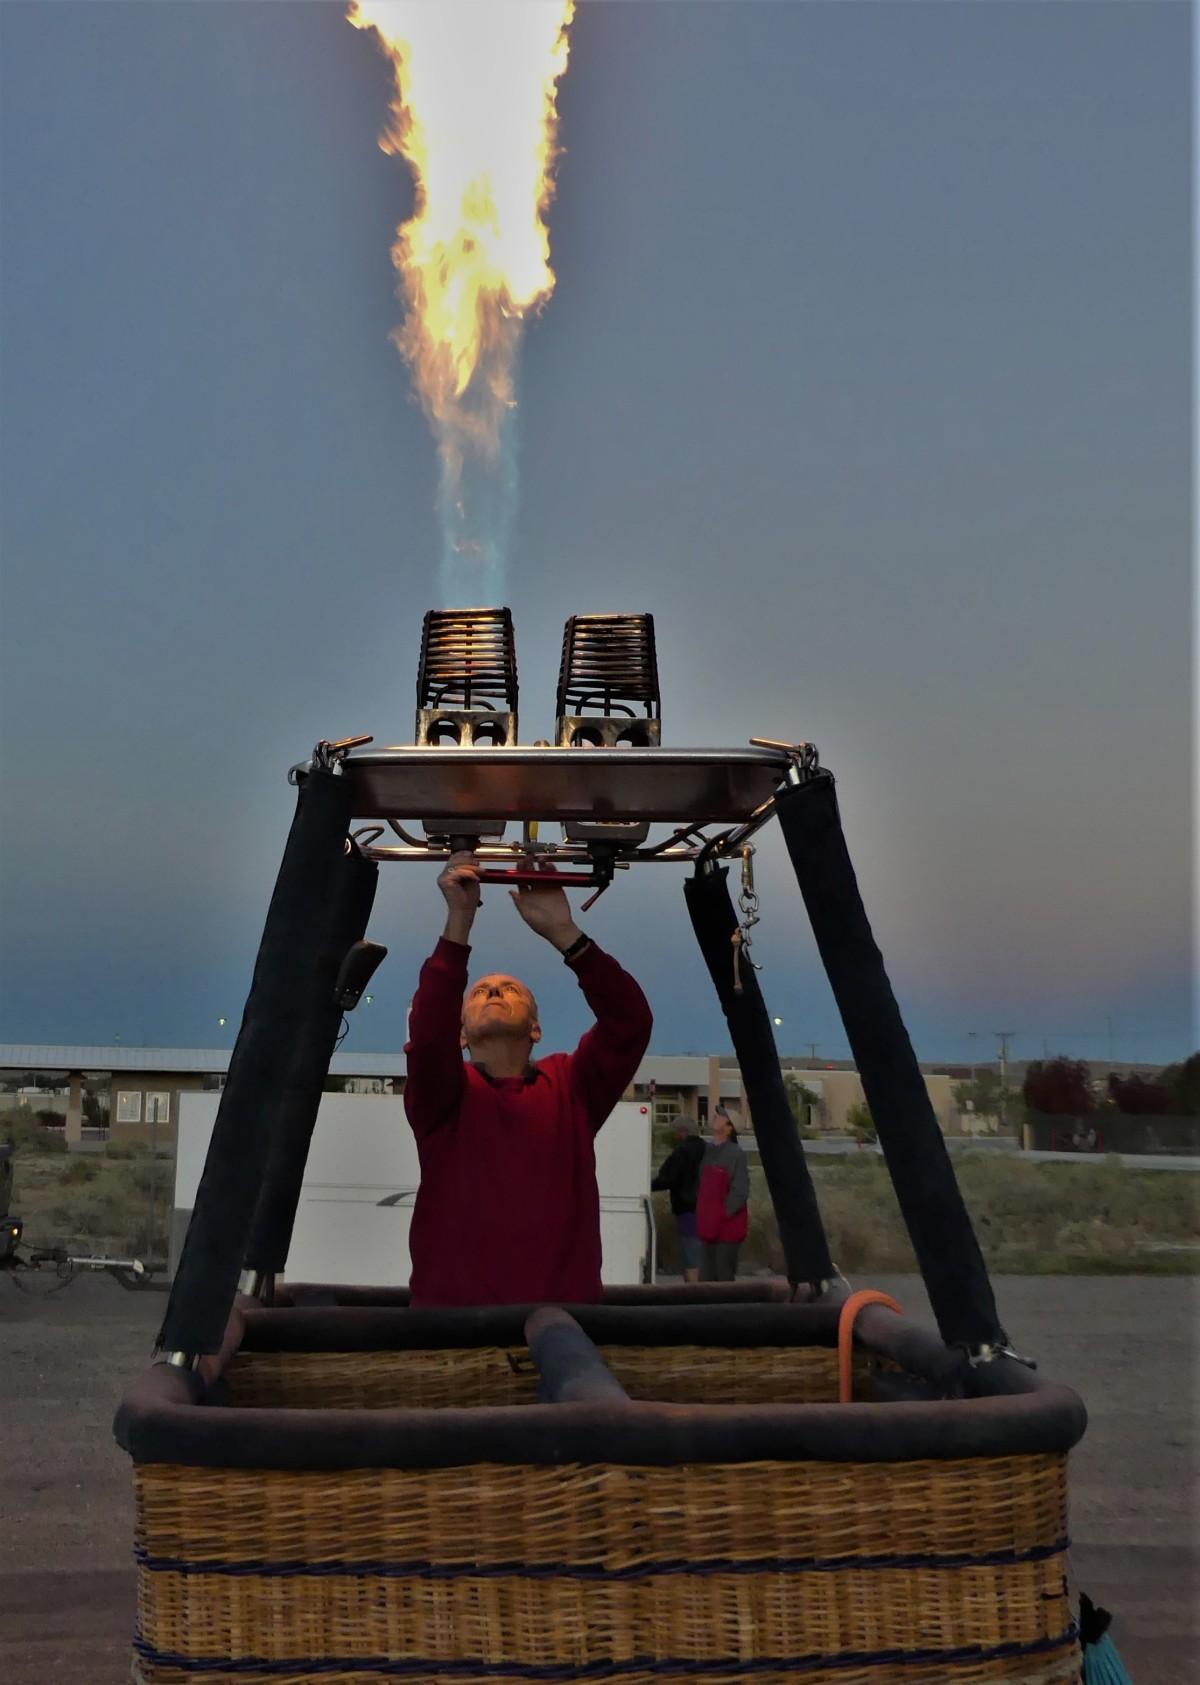 testing the burner